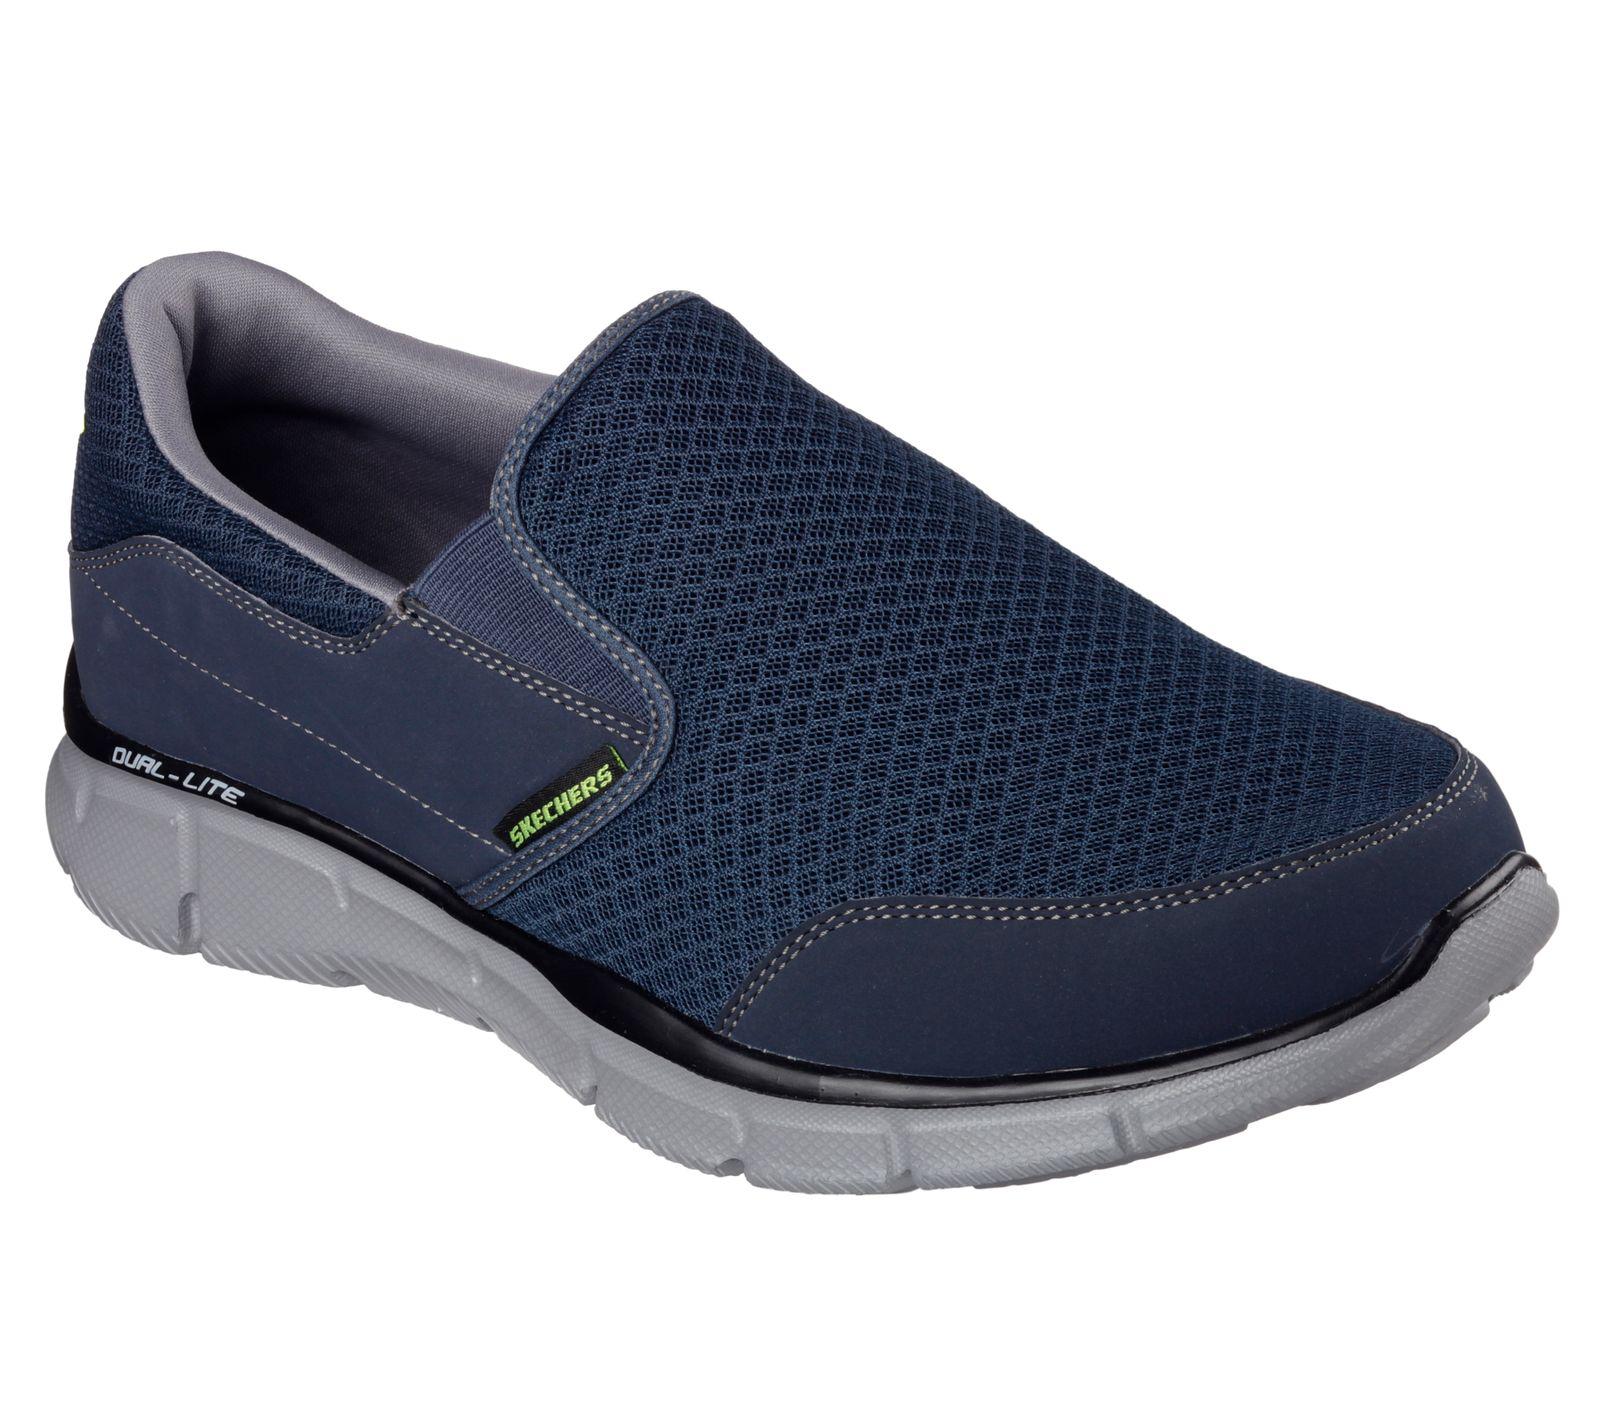 Skechers Herren Slipper EQUALIZER-PERSISTENT 51361/NVGY blau